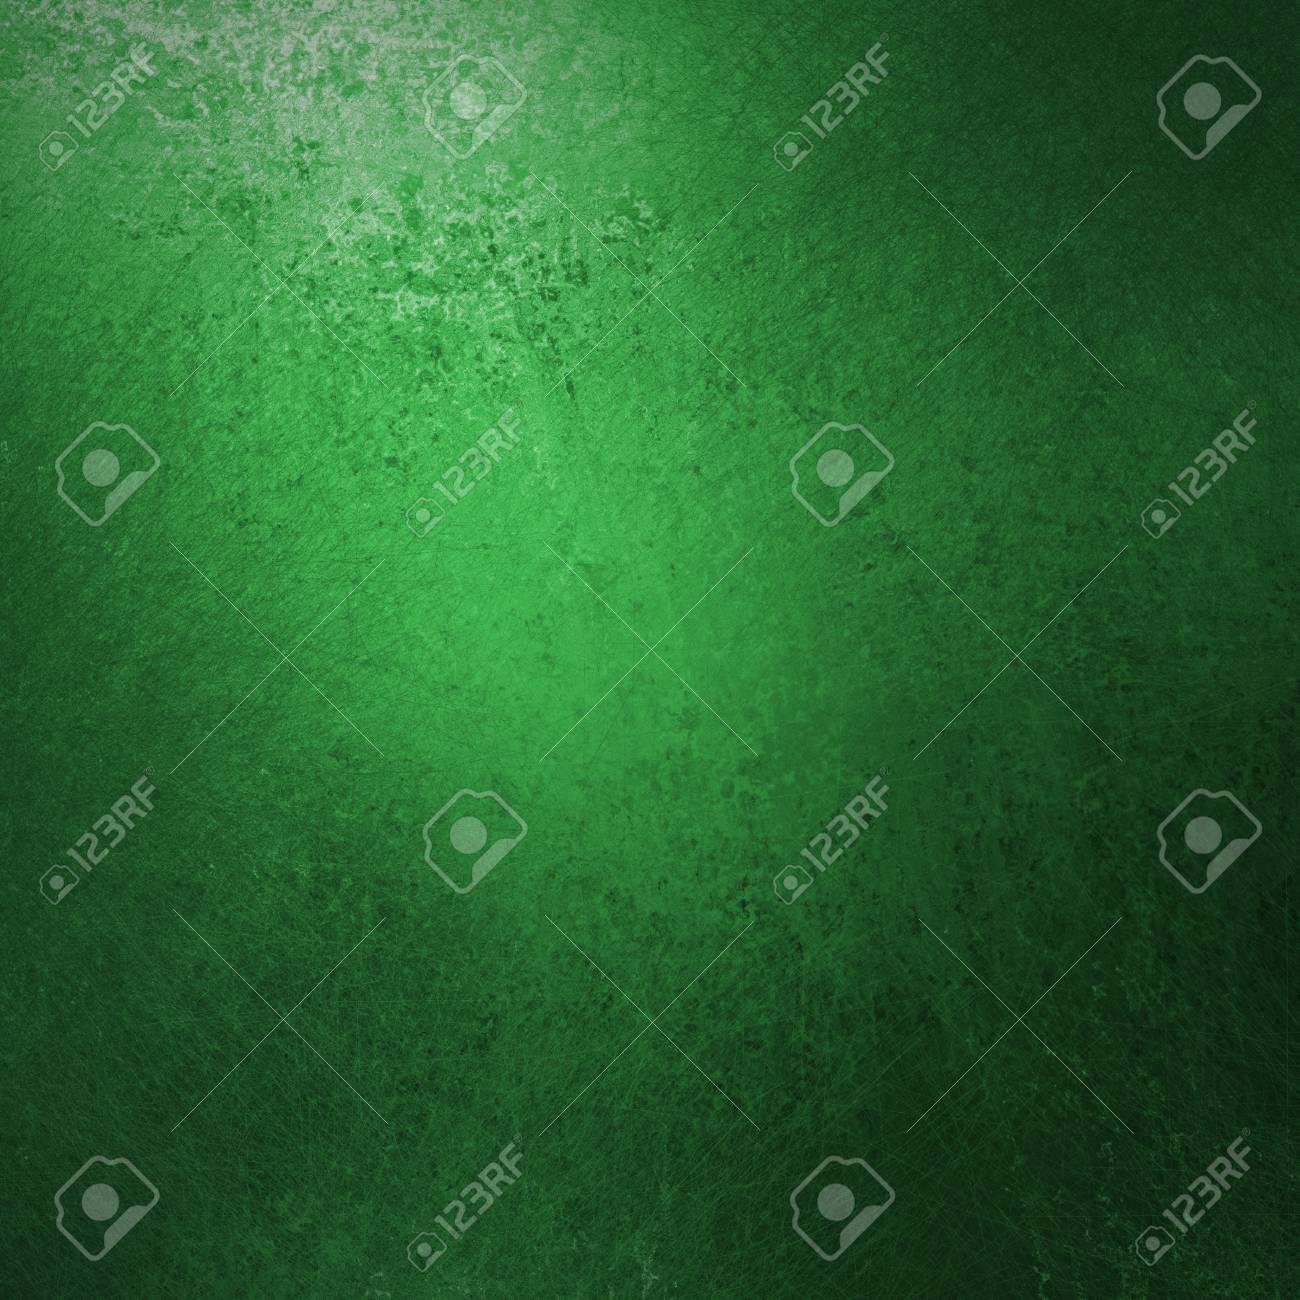 Green Background Stock Photo - 13143353